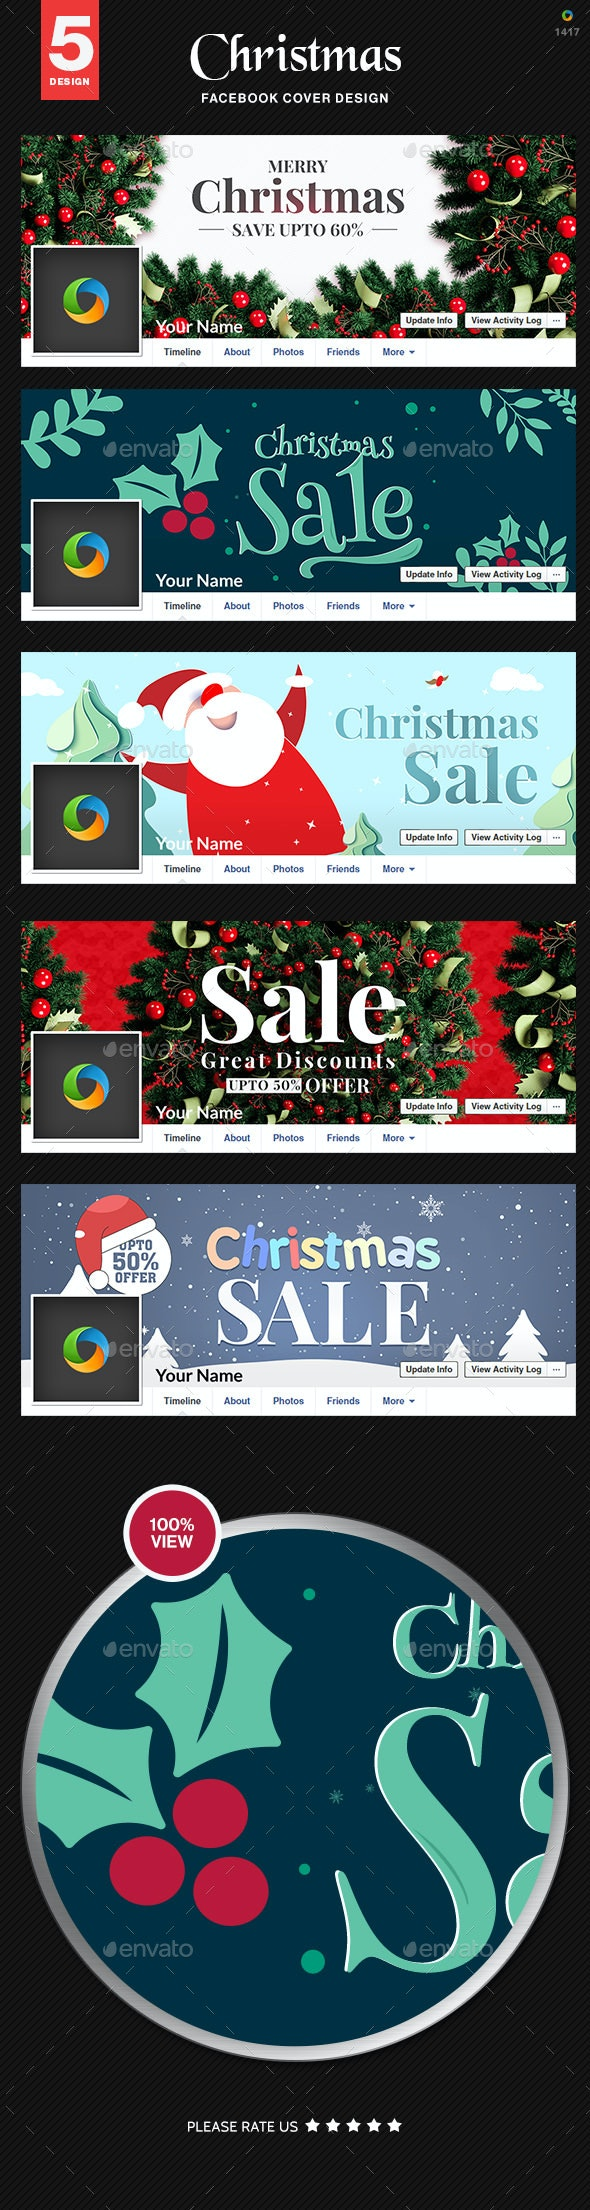 Christmas Sale Facebook Cover Templates - 5 Designs - Facebook Timeline Covers Social Media